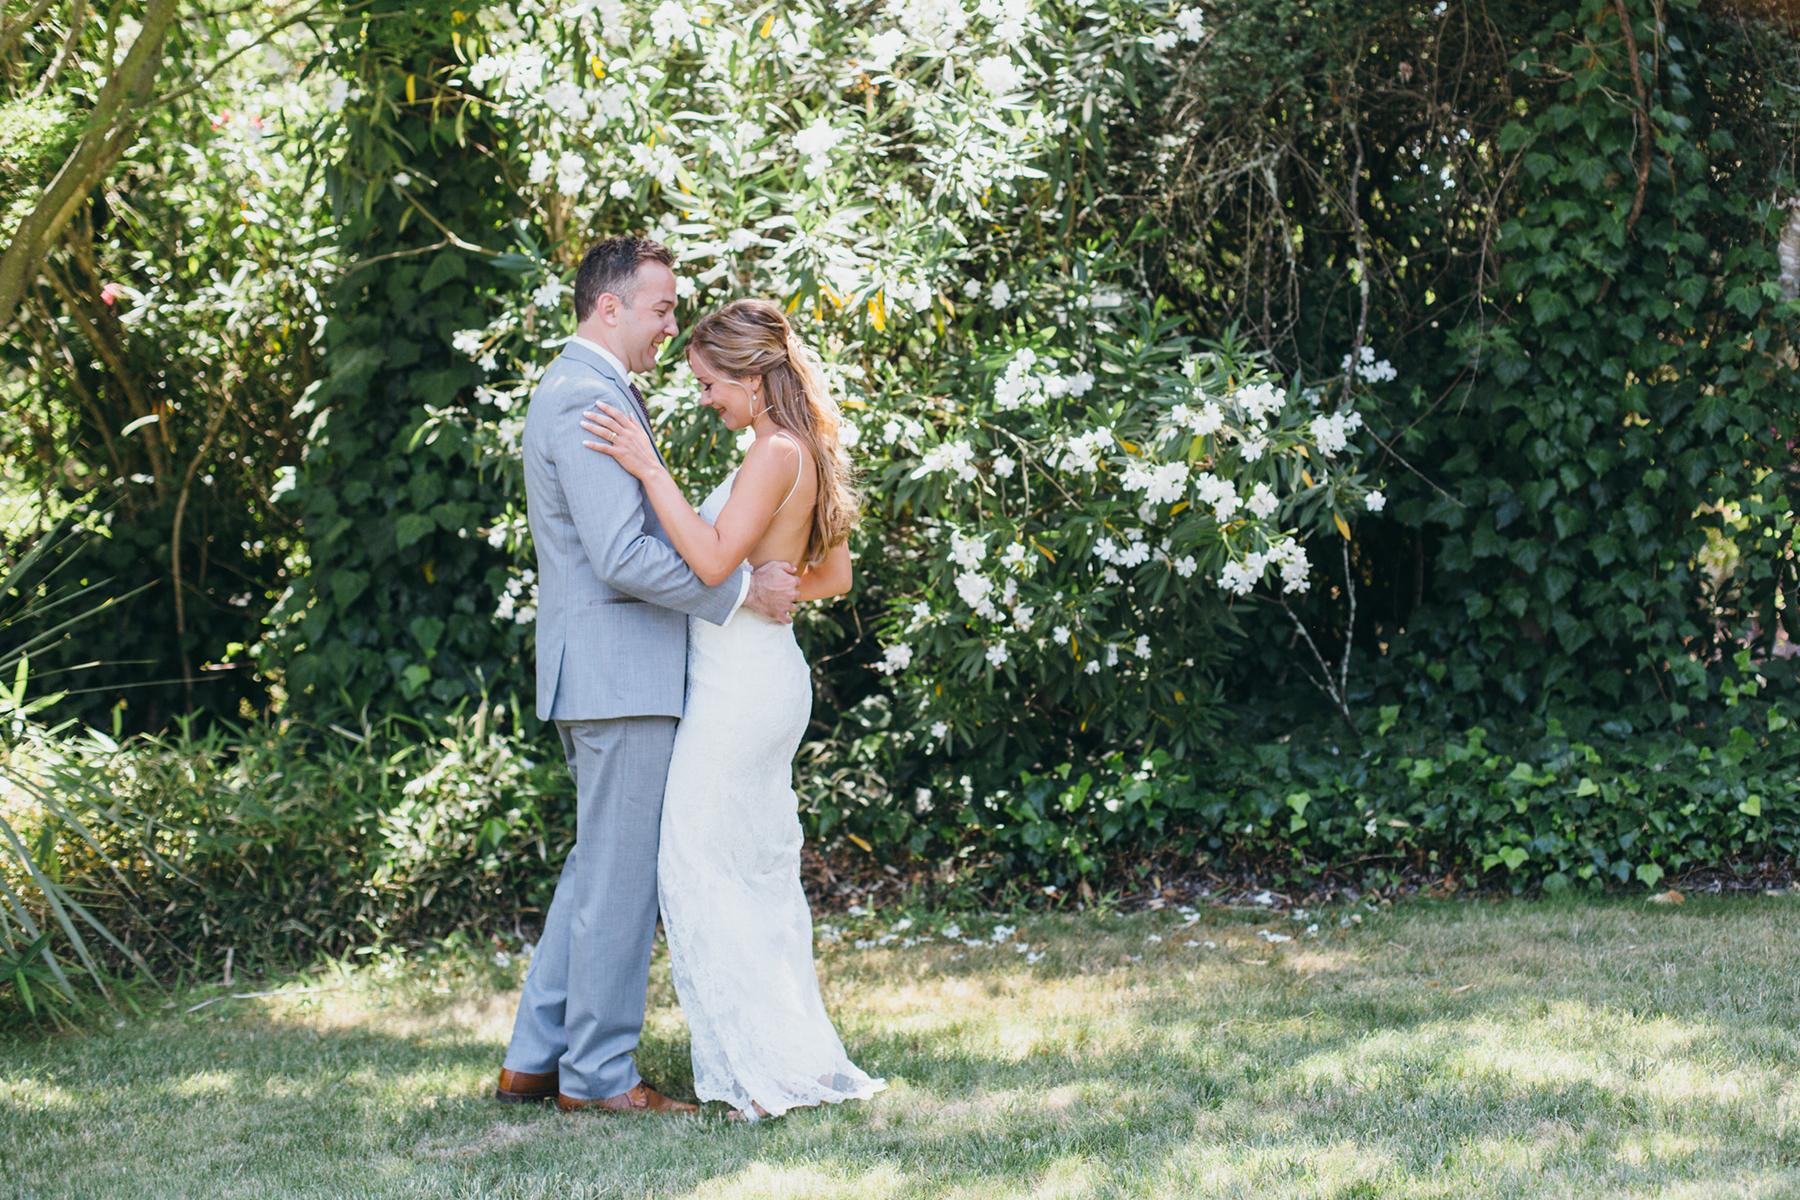 dallas-haley-napa-wedding-photographer-13.jpg